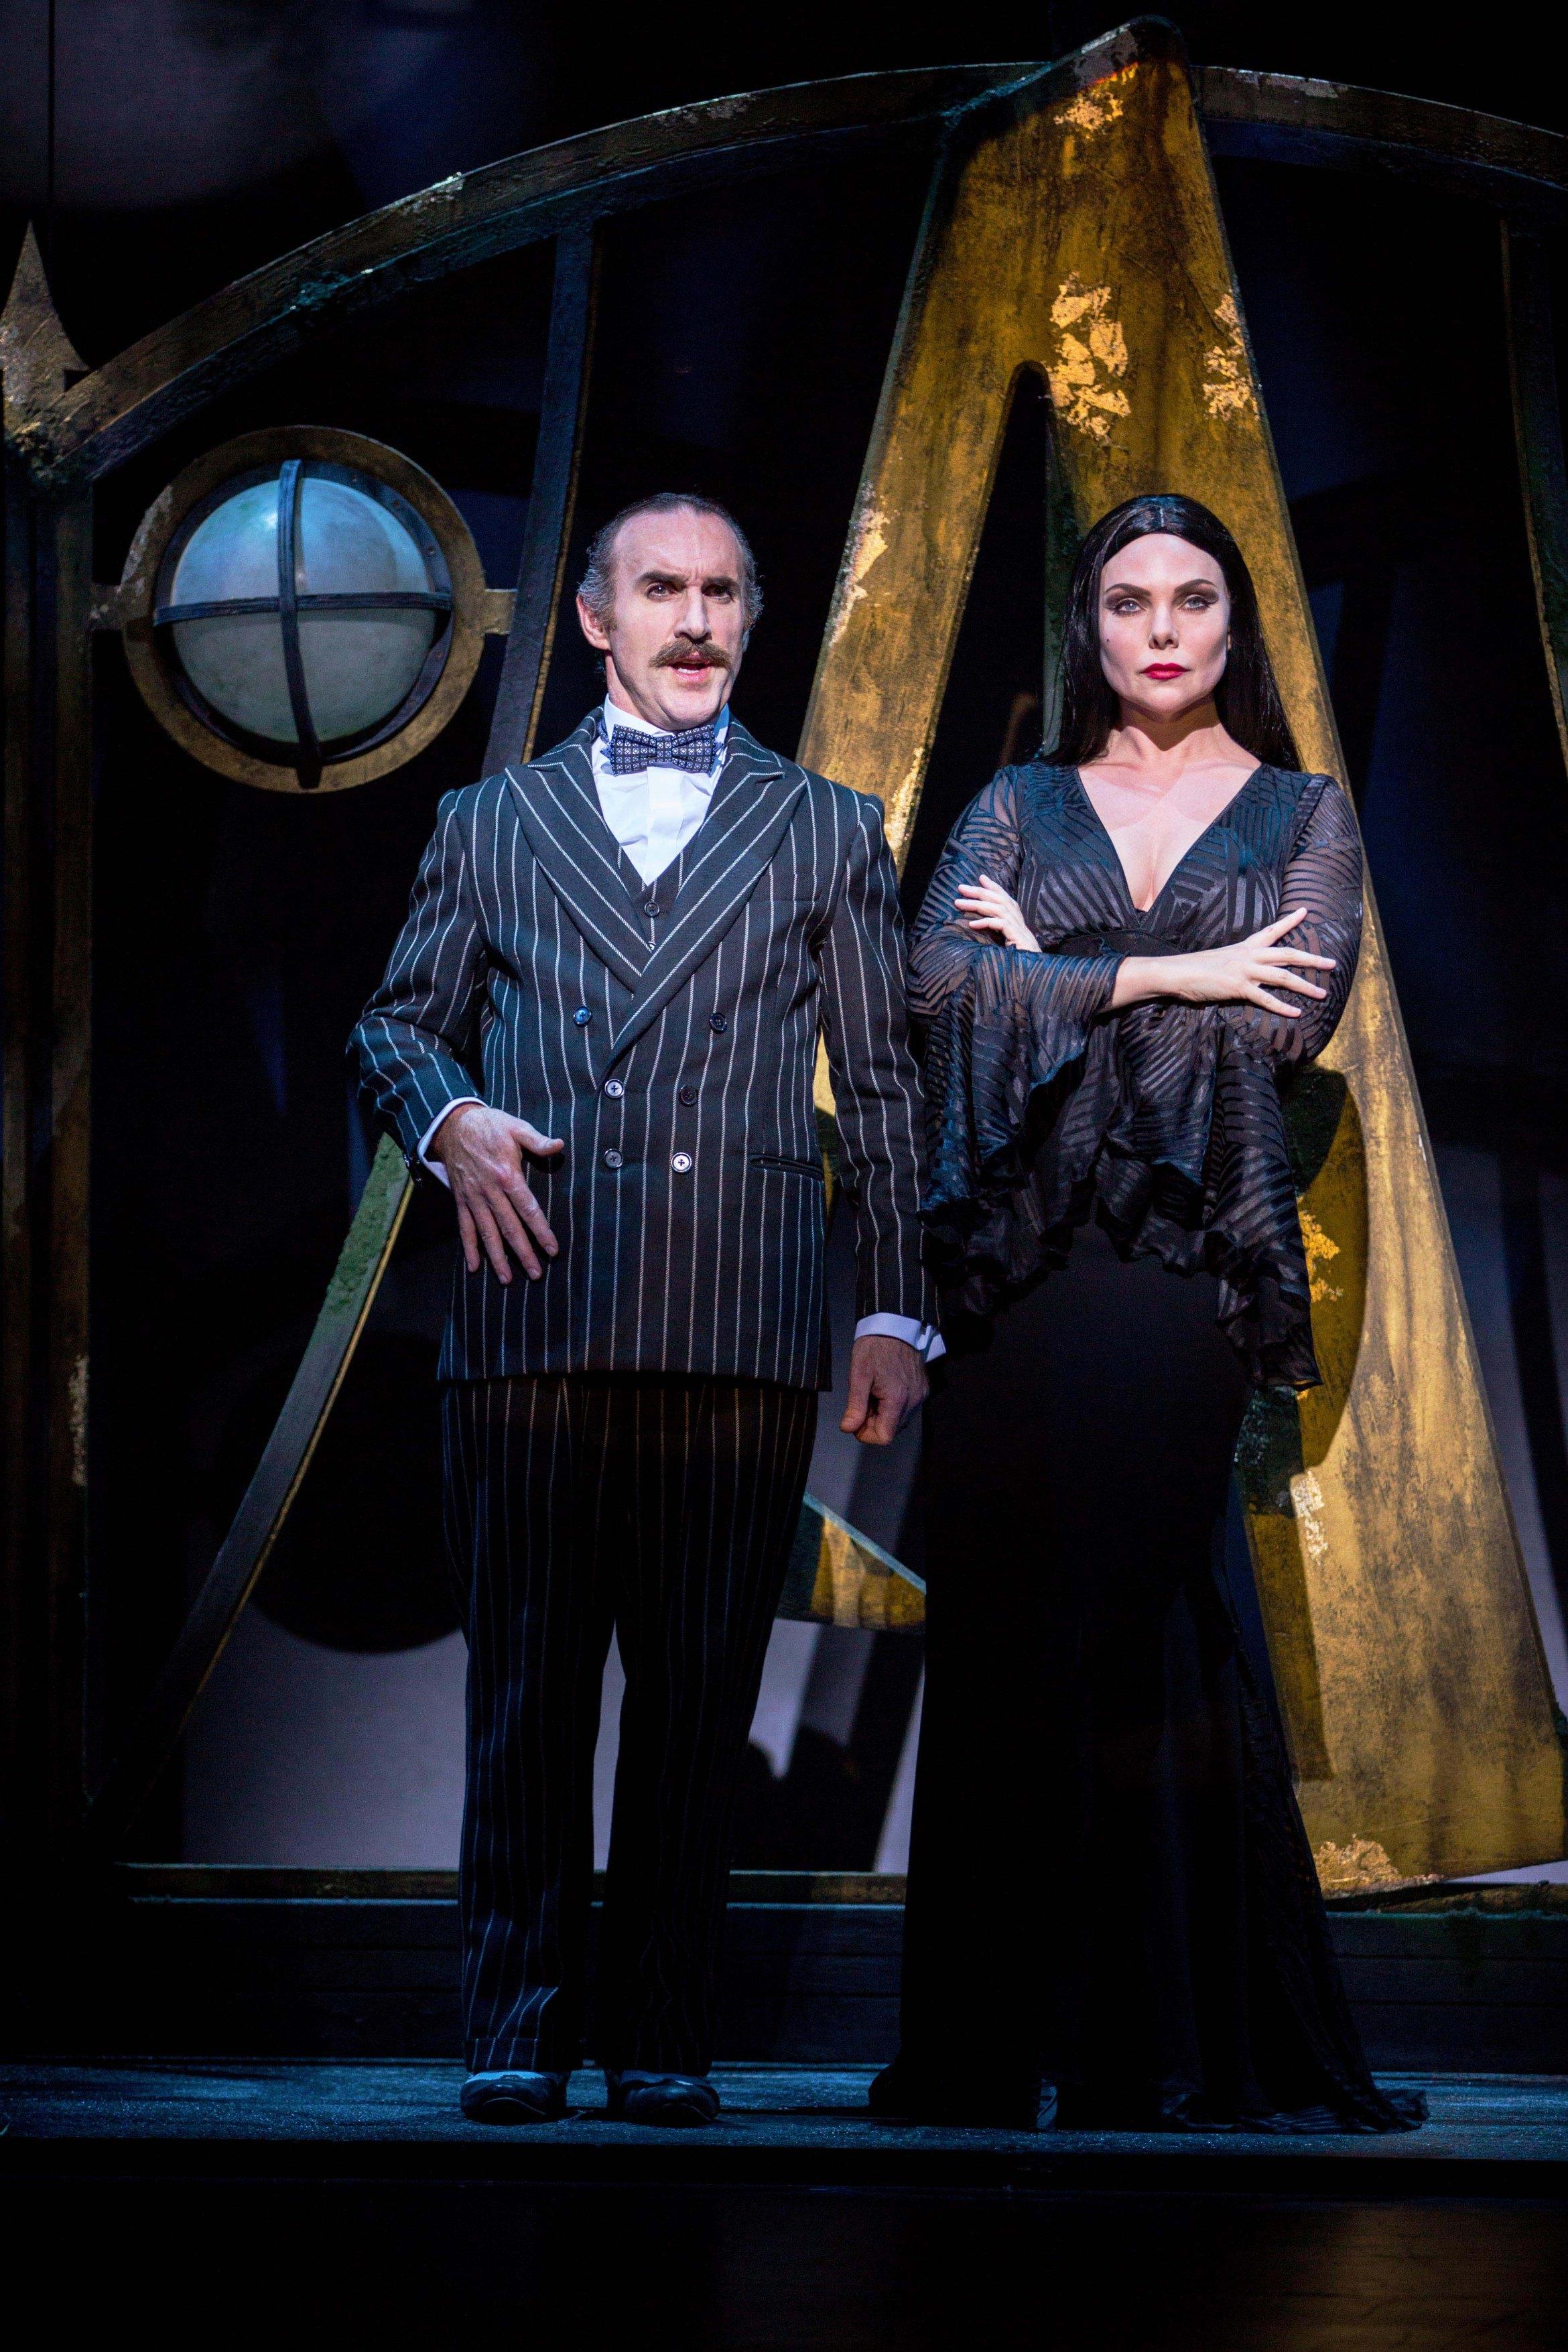 Cameron Blakely as Gomez Addams and Samantha Womack as Morticia Addams in THE ADDAMS FAMILY. Credit Matt Martin.jpg